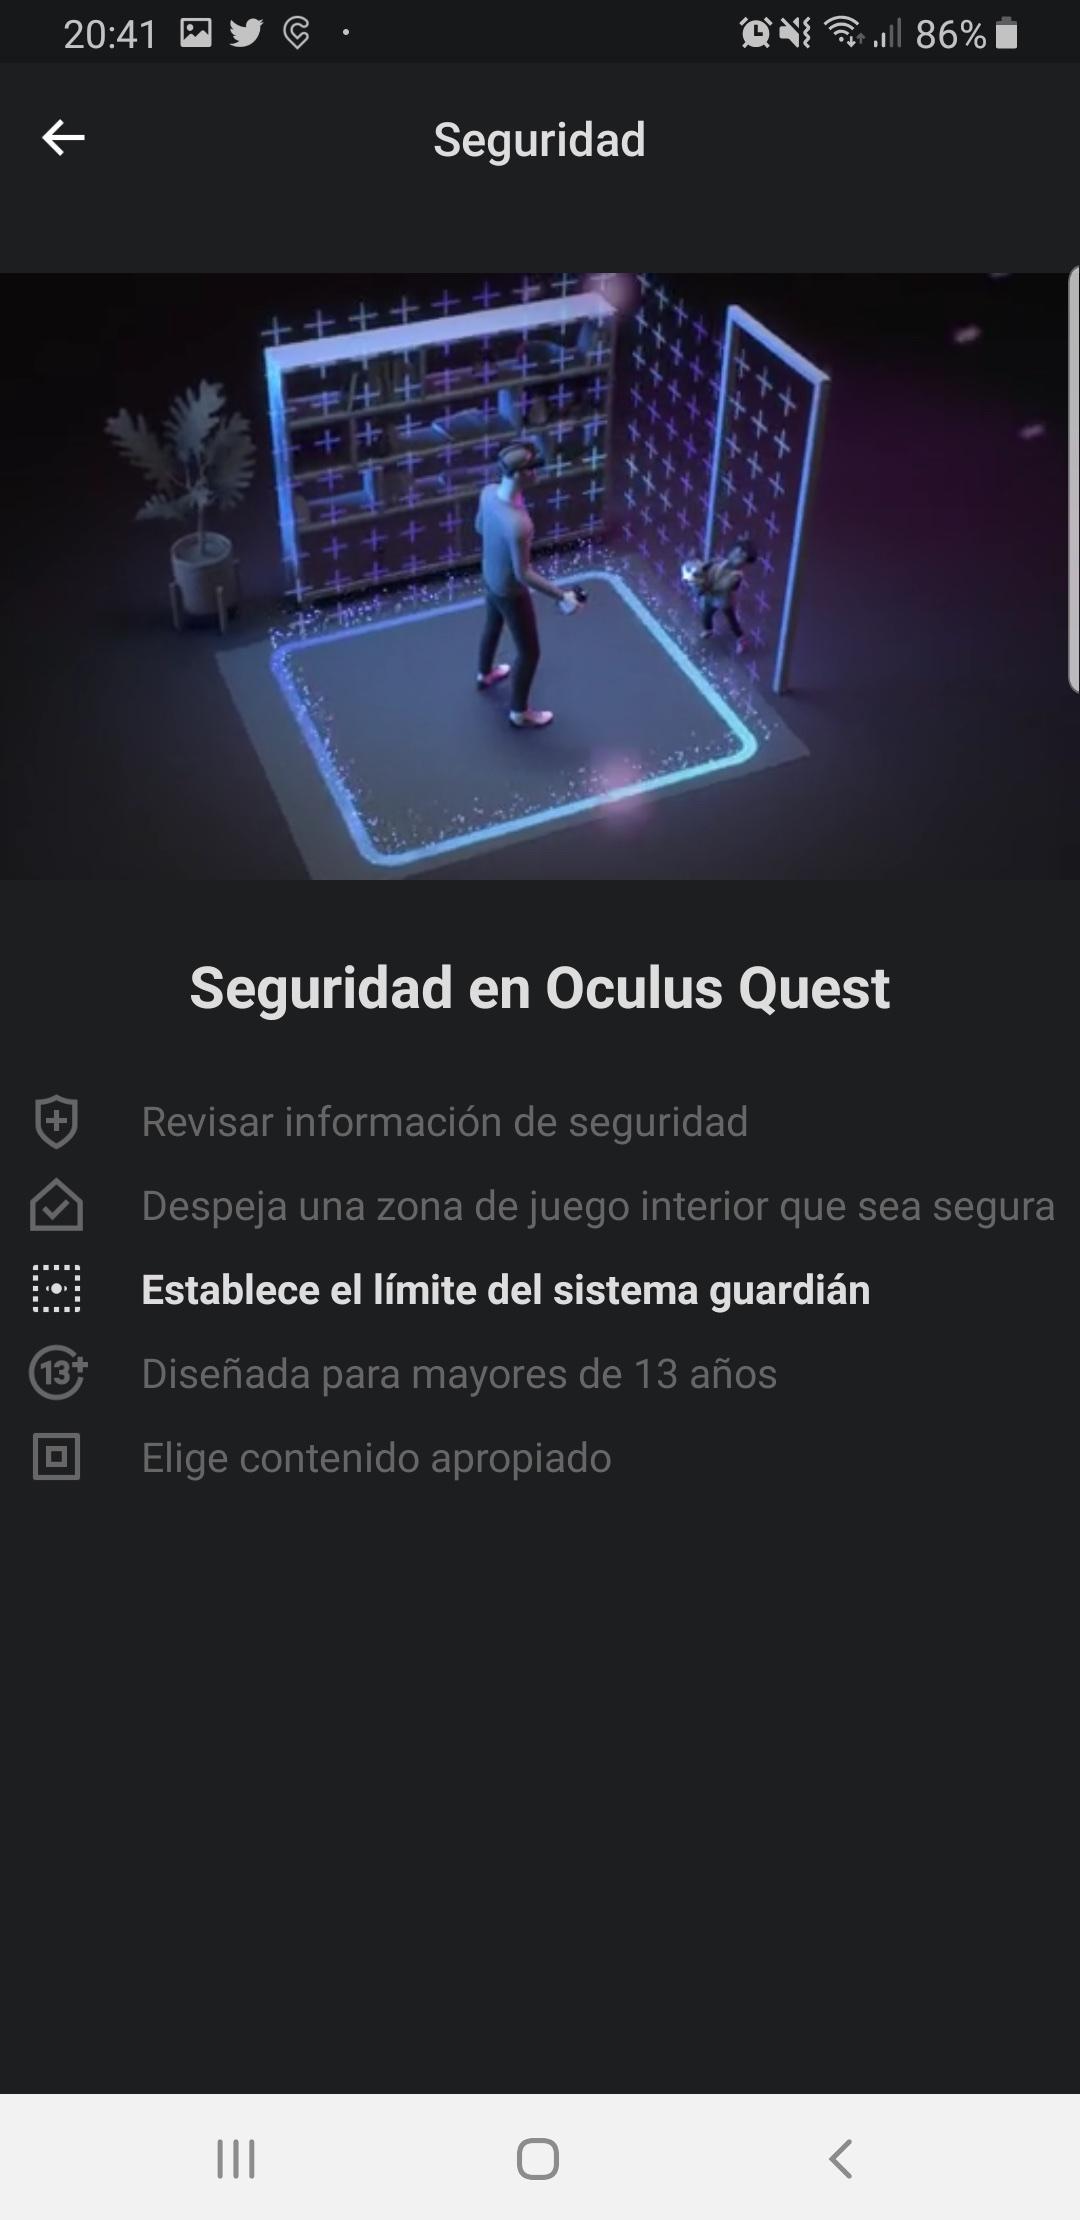 Oculus Quest sistema guardián